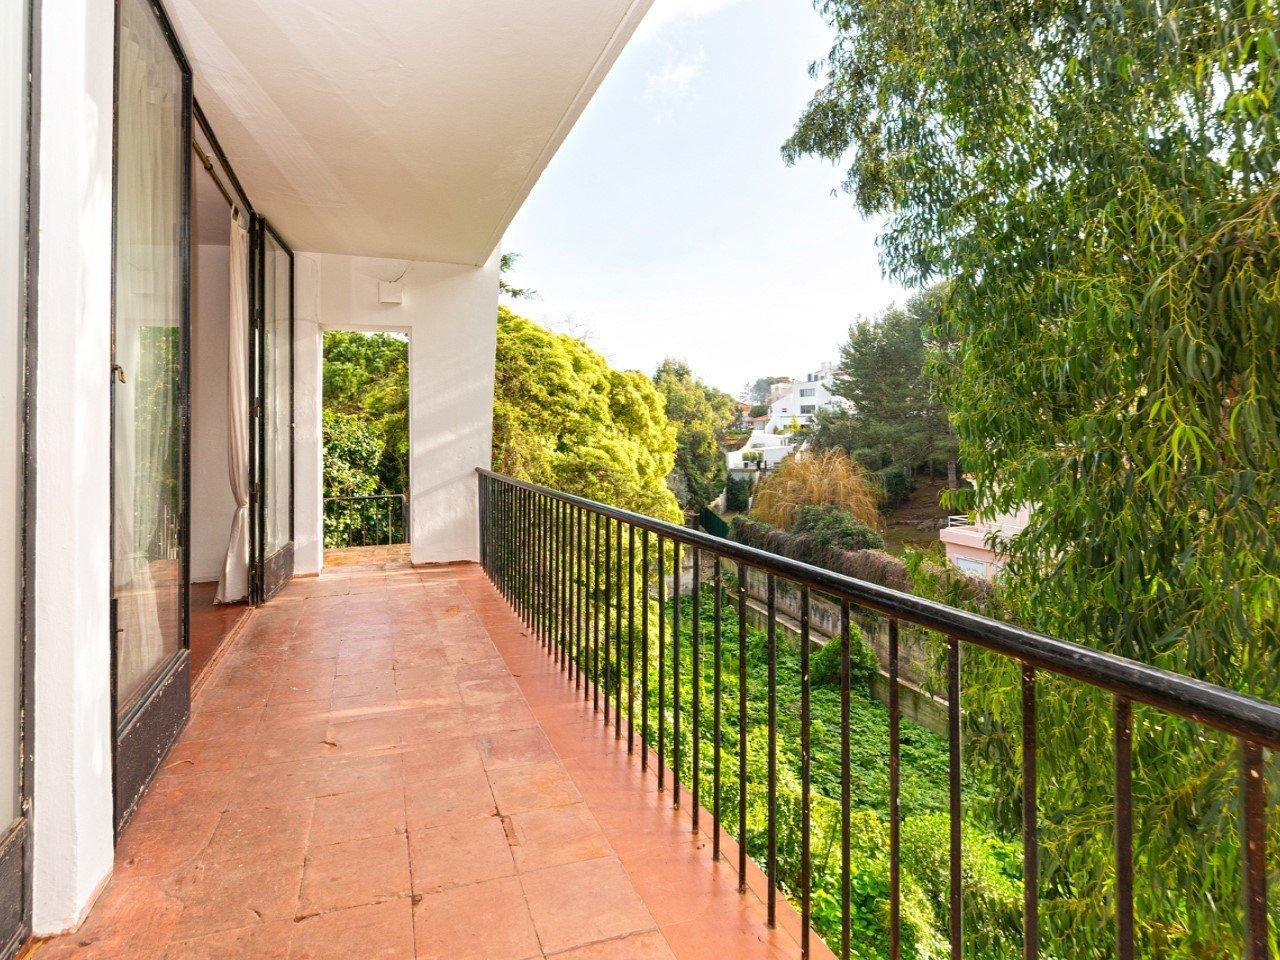 10 Bedroom Villa Cascais, Lisbon Ref: AMV13898